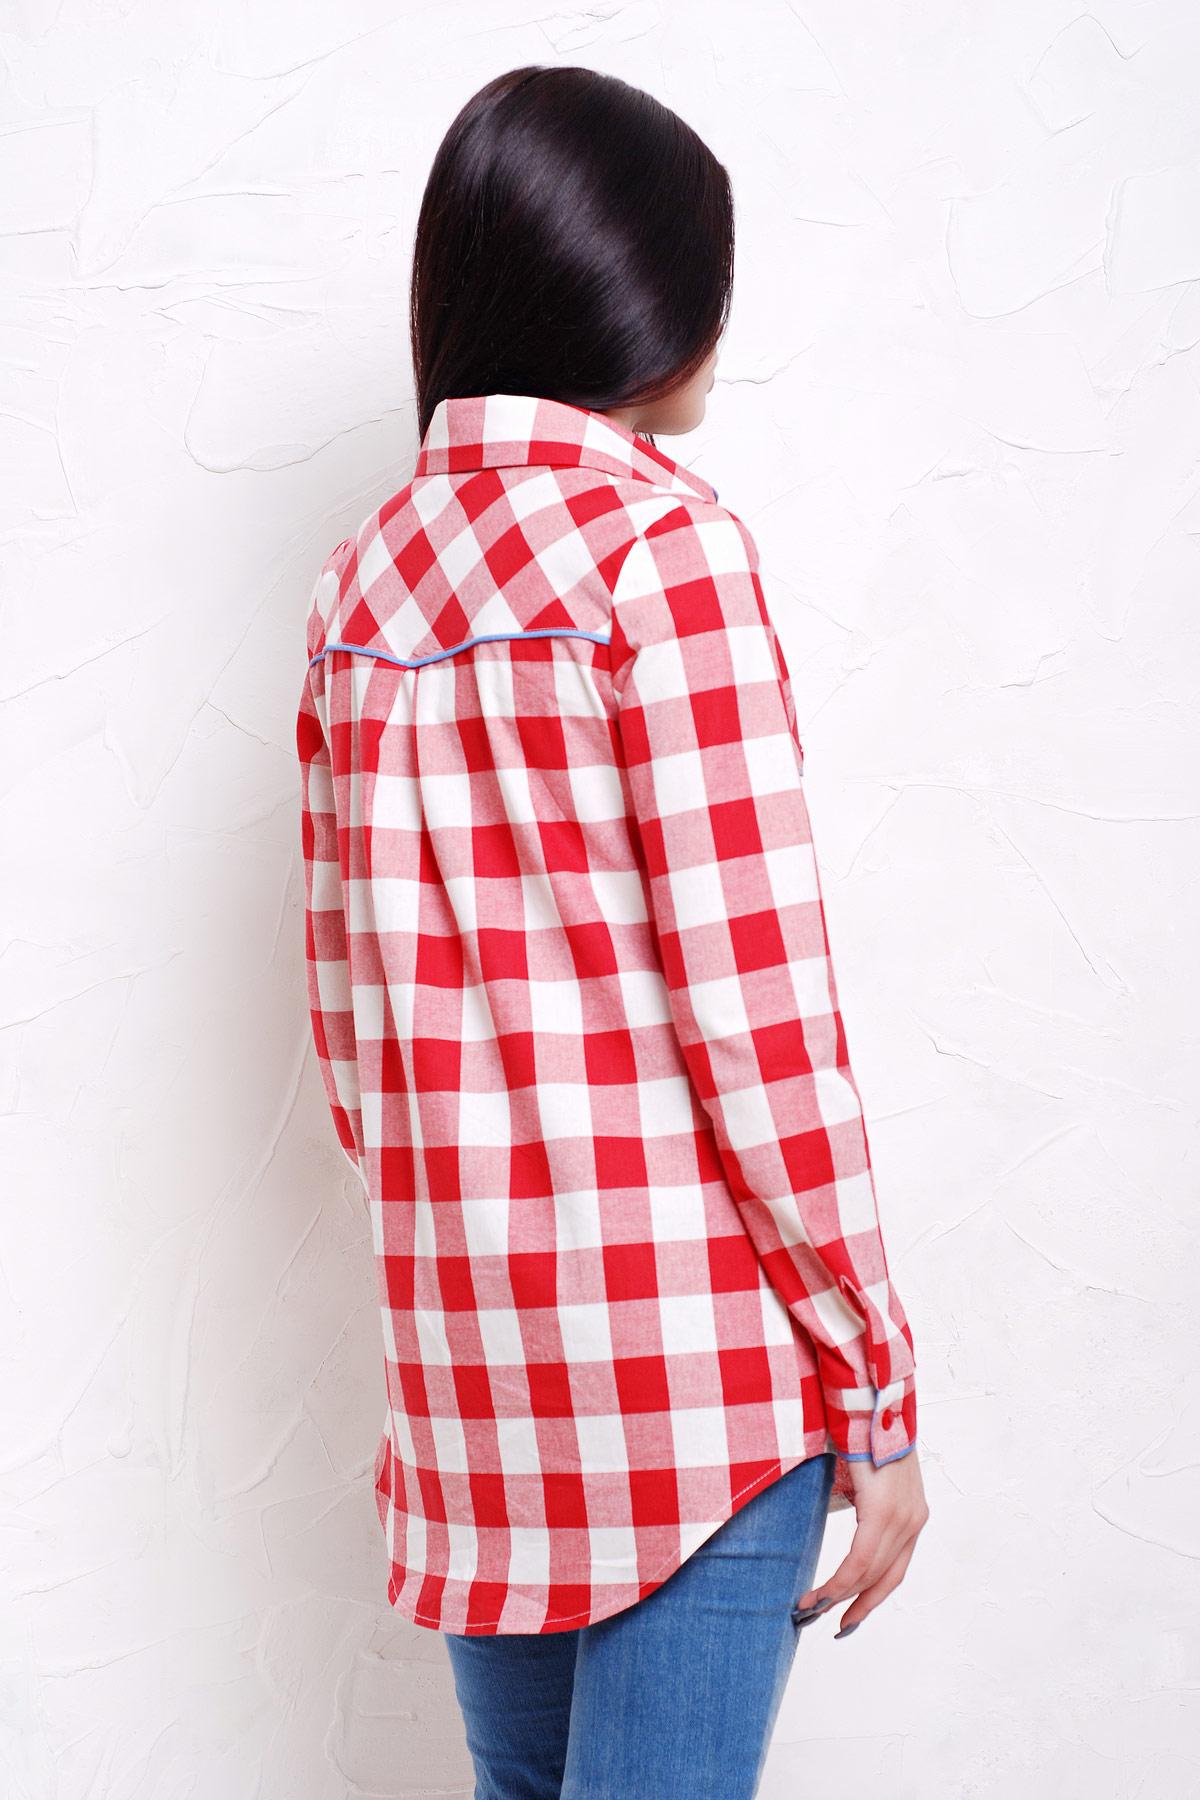 10bc5390670 женская рубашка в красно-белую клетку. блуза Канзас д р. Цвет